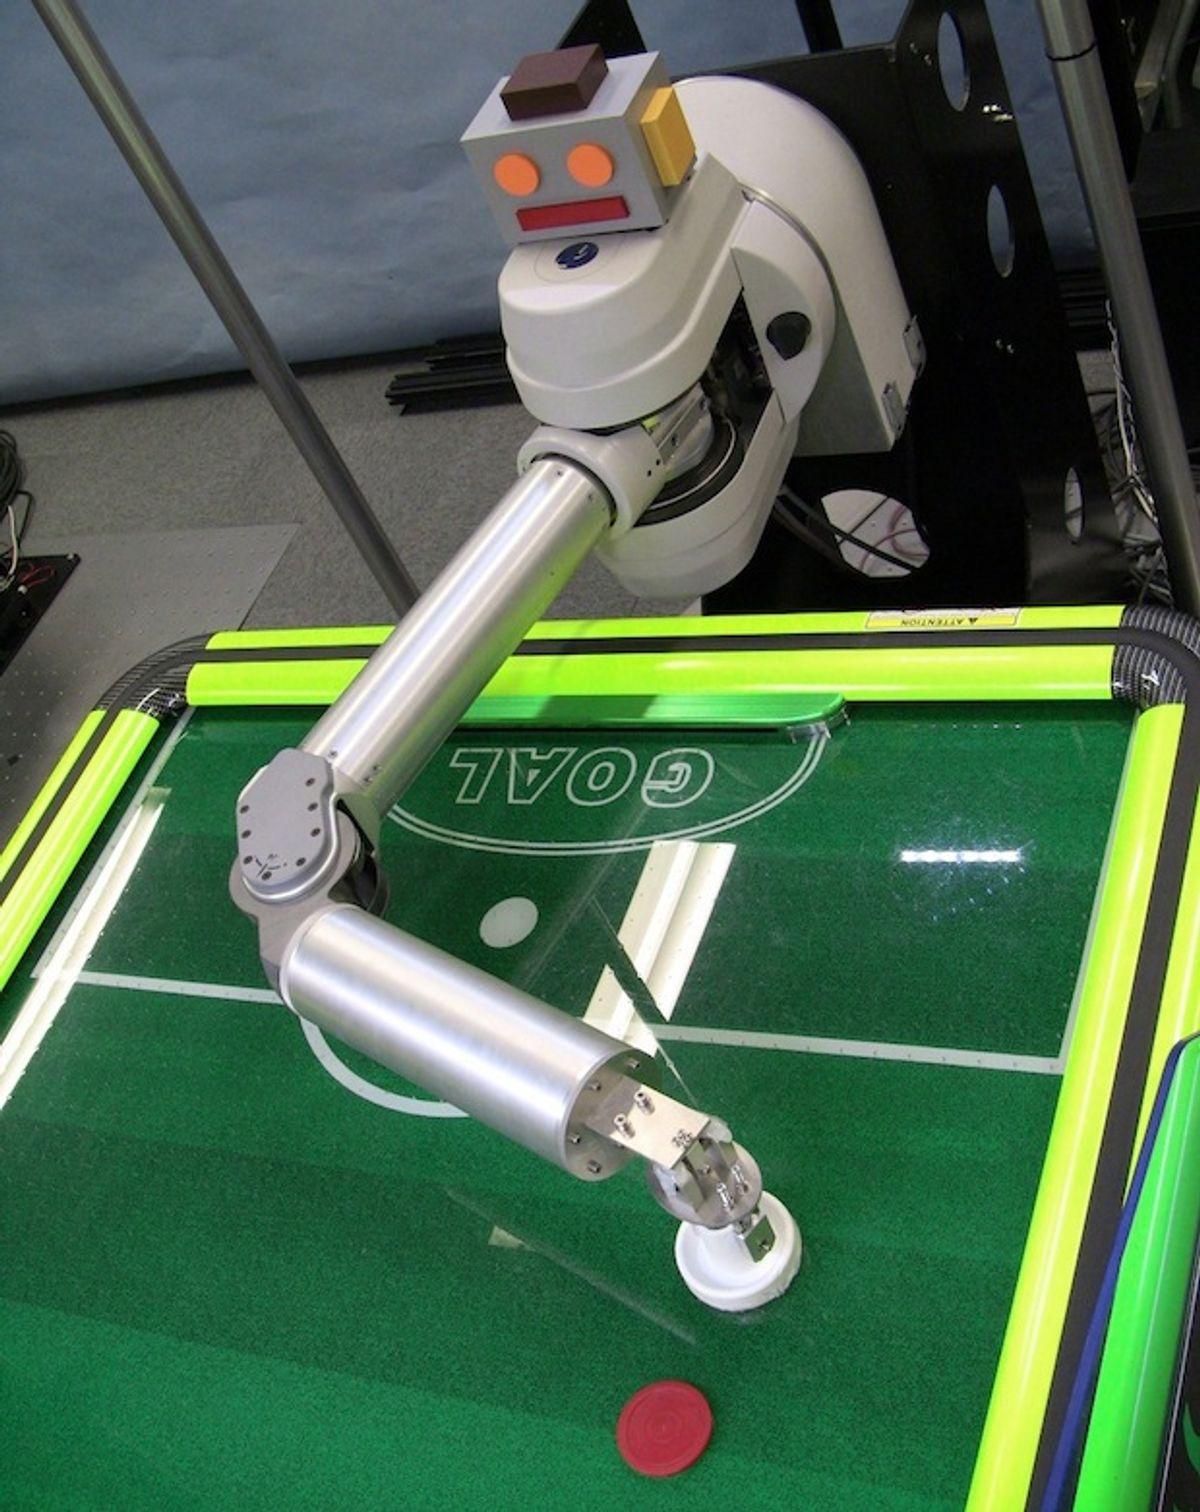 This Robot Wants to Beat You at Air Hockey